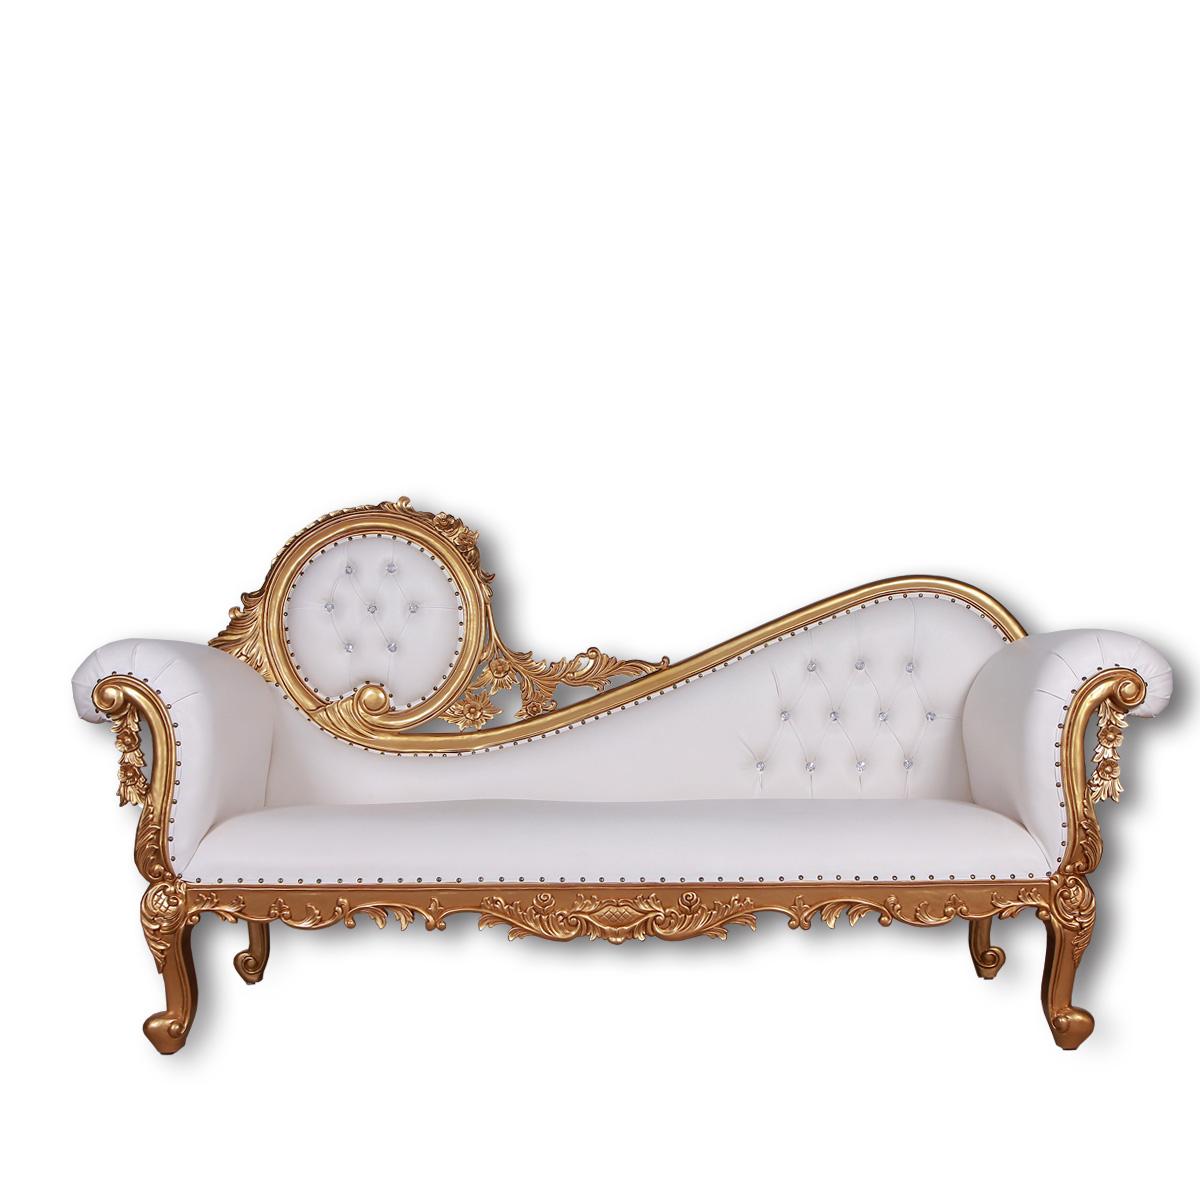 Full Size of Barock Recamiere Chaiselongue Diplomatie Rot Boudoir Barockmbel Thronstuhl King Chair Sofa Im Gothic Mit Bett Wohnzimmer Recamiere Barock